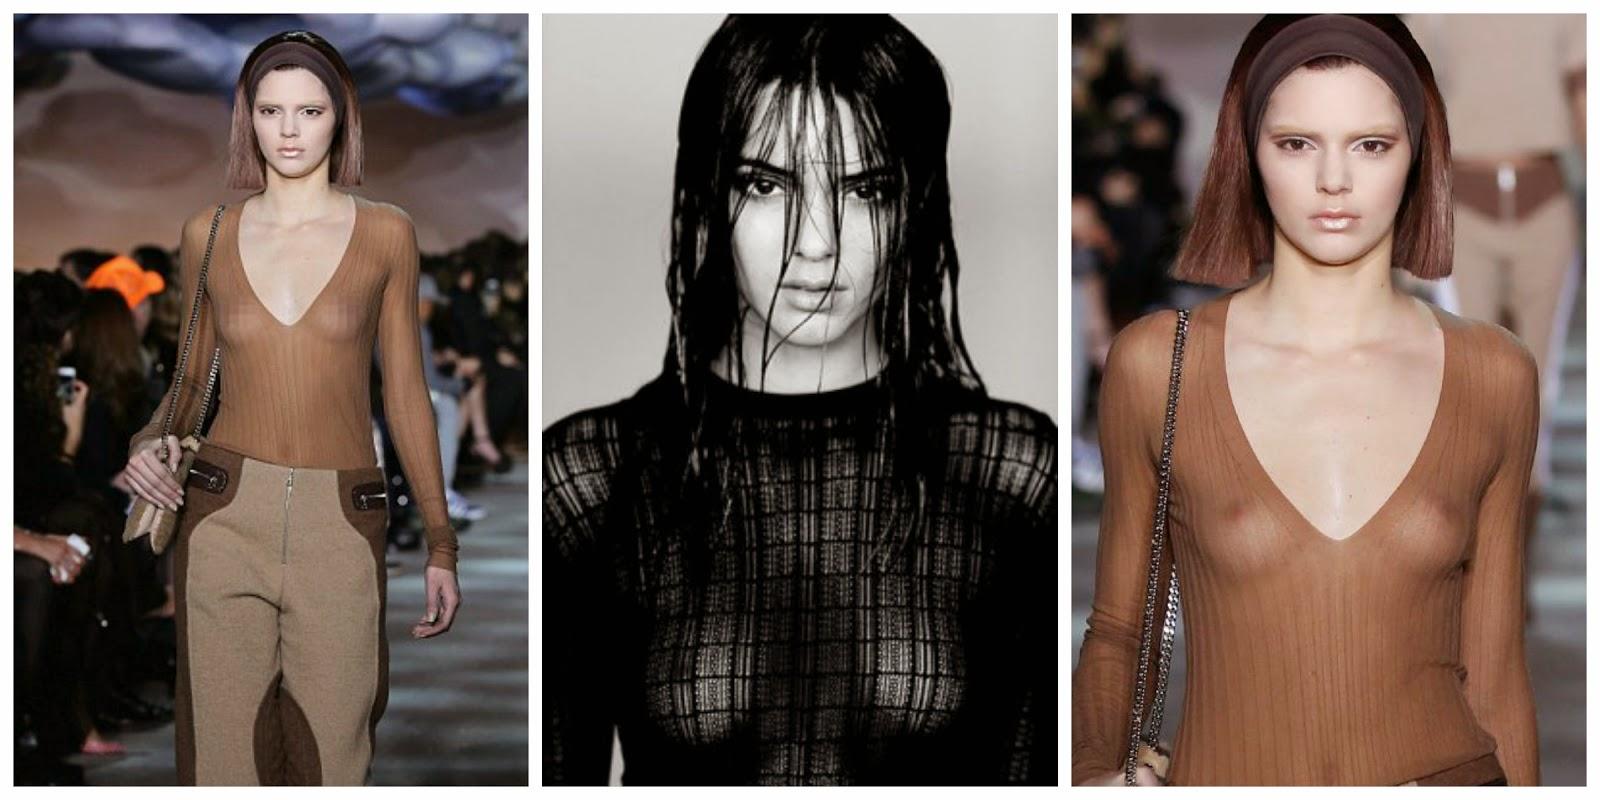 Taking Kendall Jenner's Modelling Career Seriously